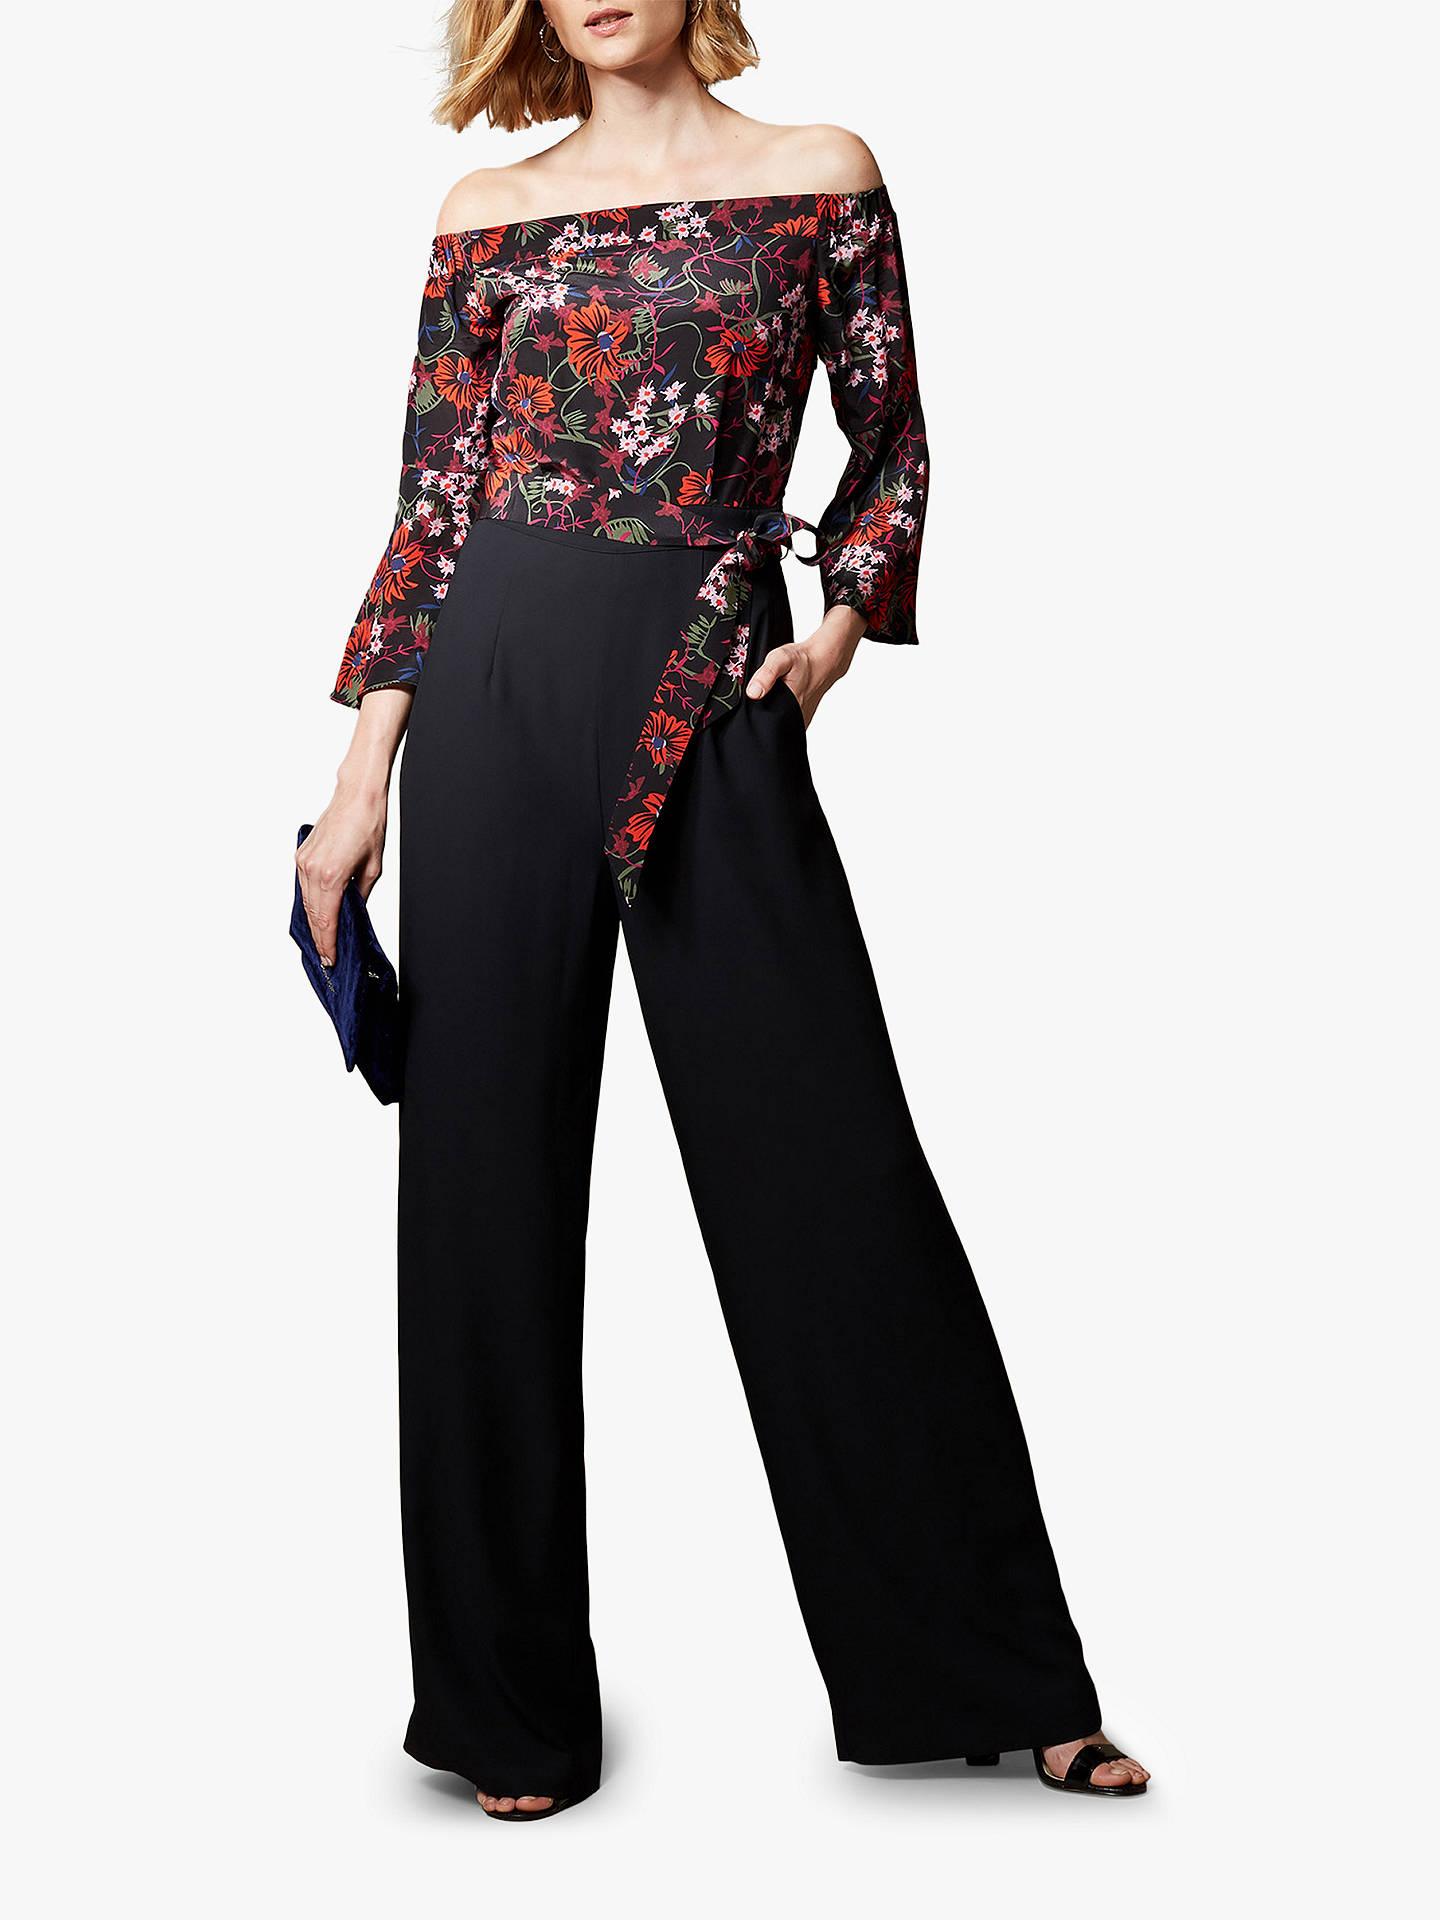 34d0ba1efc21 Buy Karen Millen Bardot Wide Leg Floral Jumpsuit